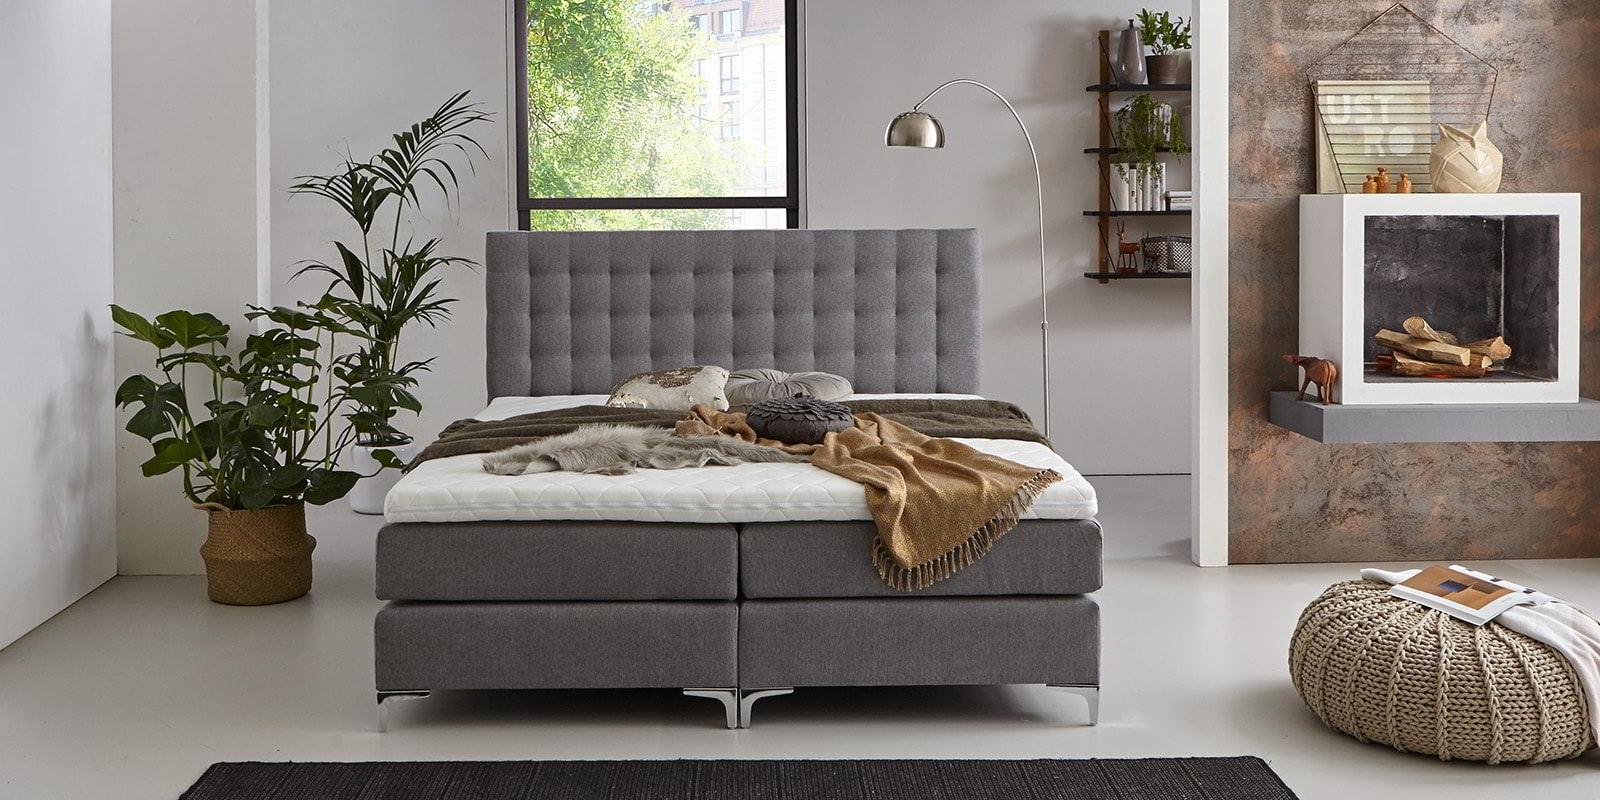 Boxspringbett Pisa Designer Bett Hotelbett Günstig Online Kaufen Bei Moebella24